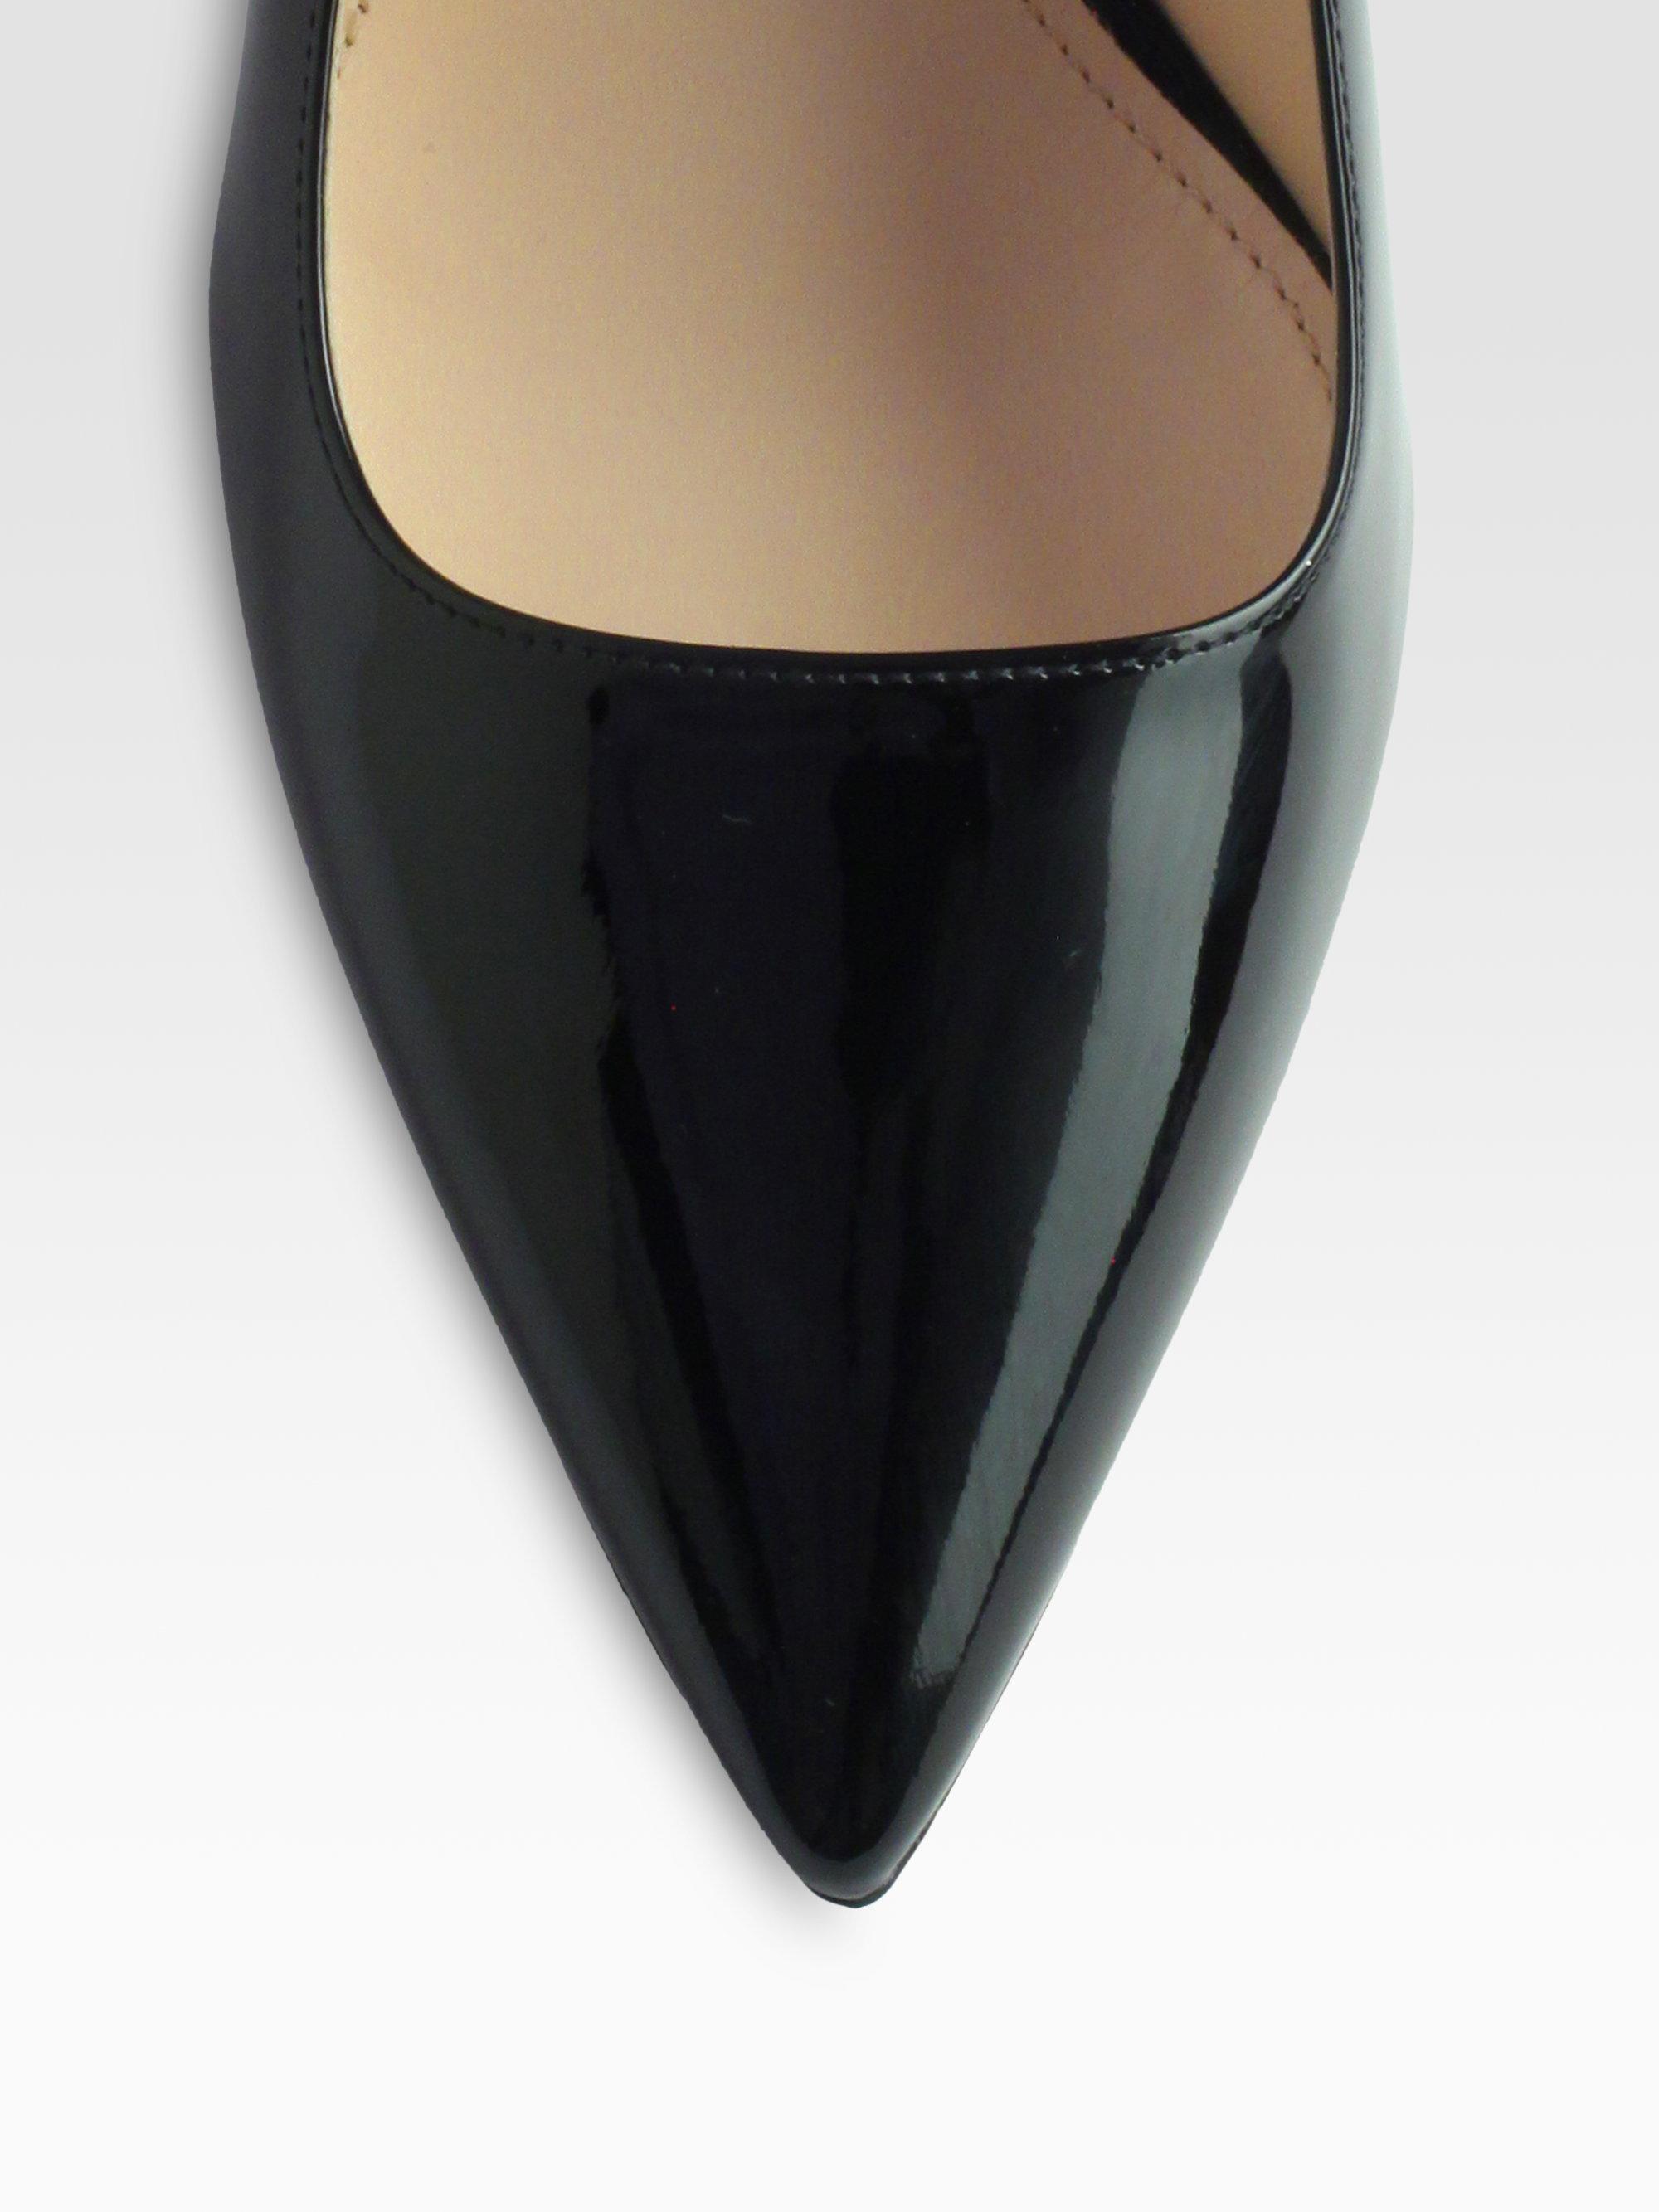 Prada Patent Leather Metal Heel Pumps in Black (nero-black) | Lyst